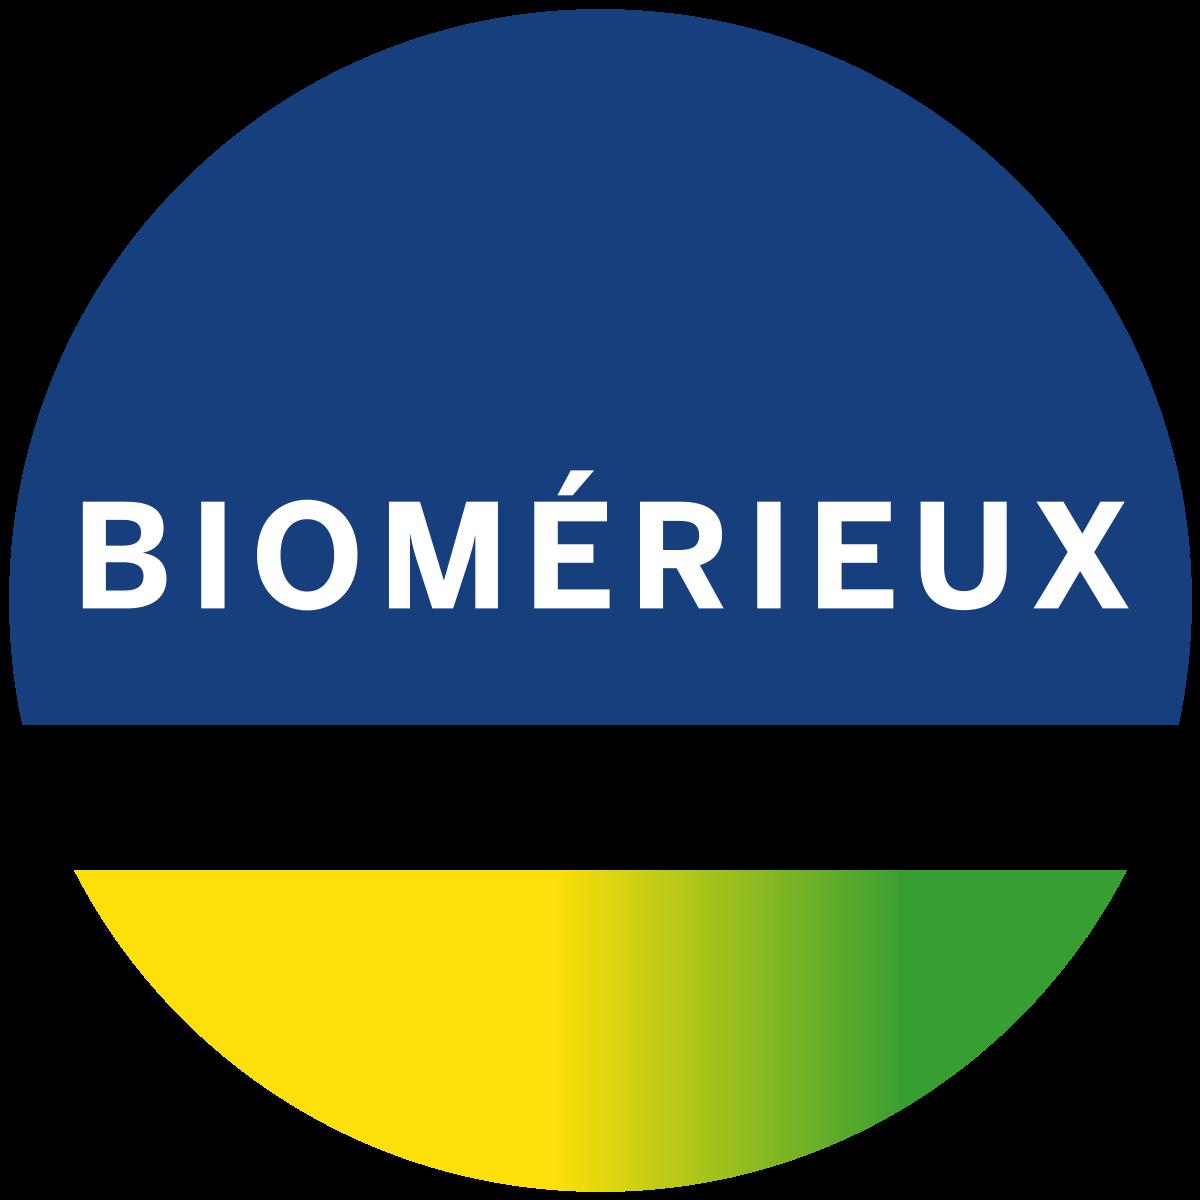 BIOMERIEUX Company Profile